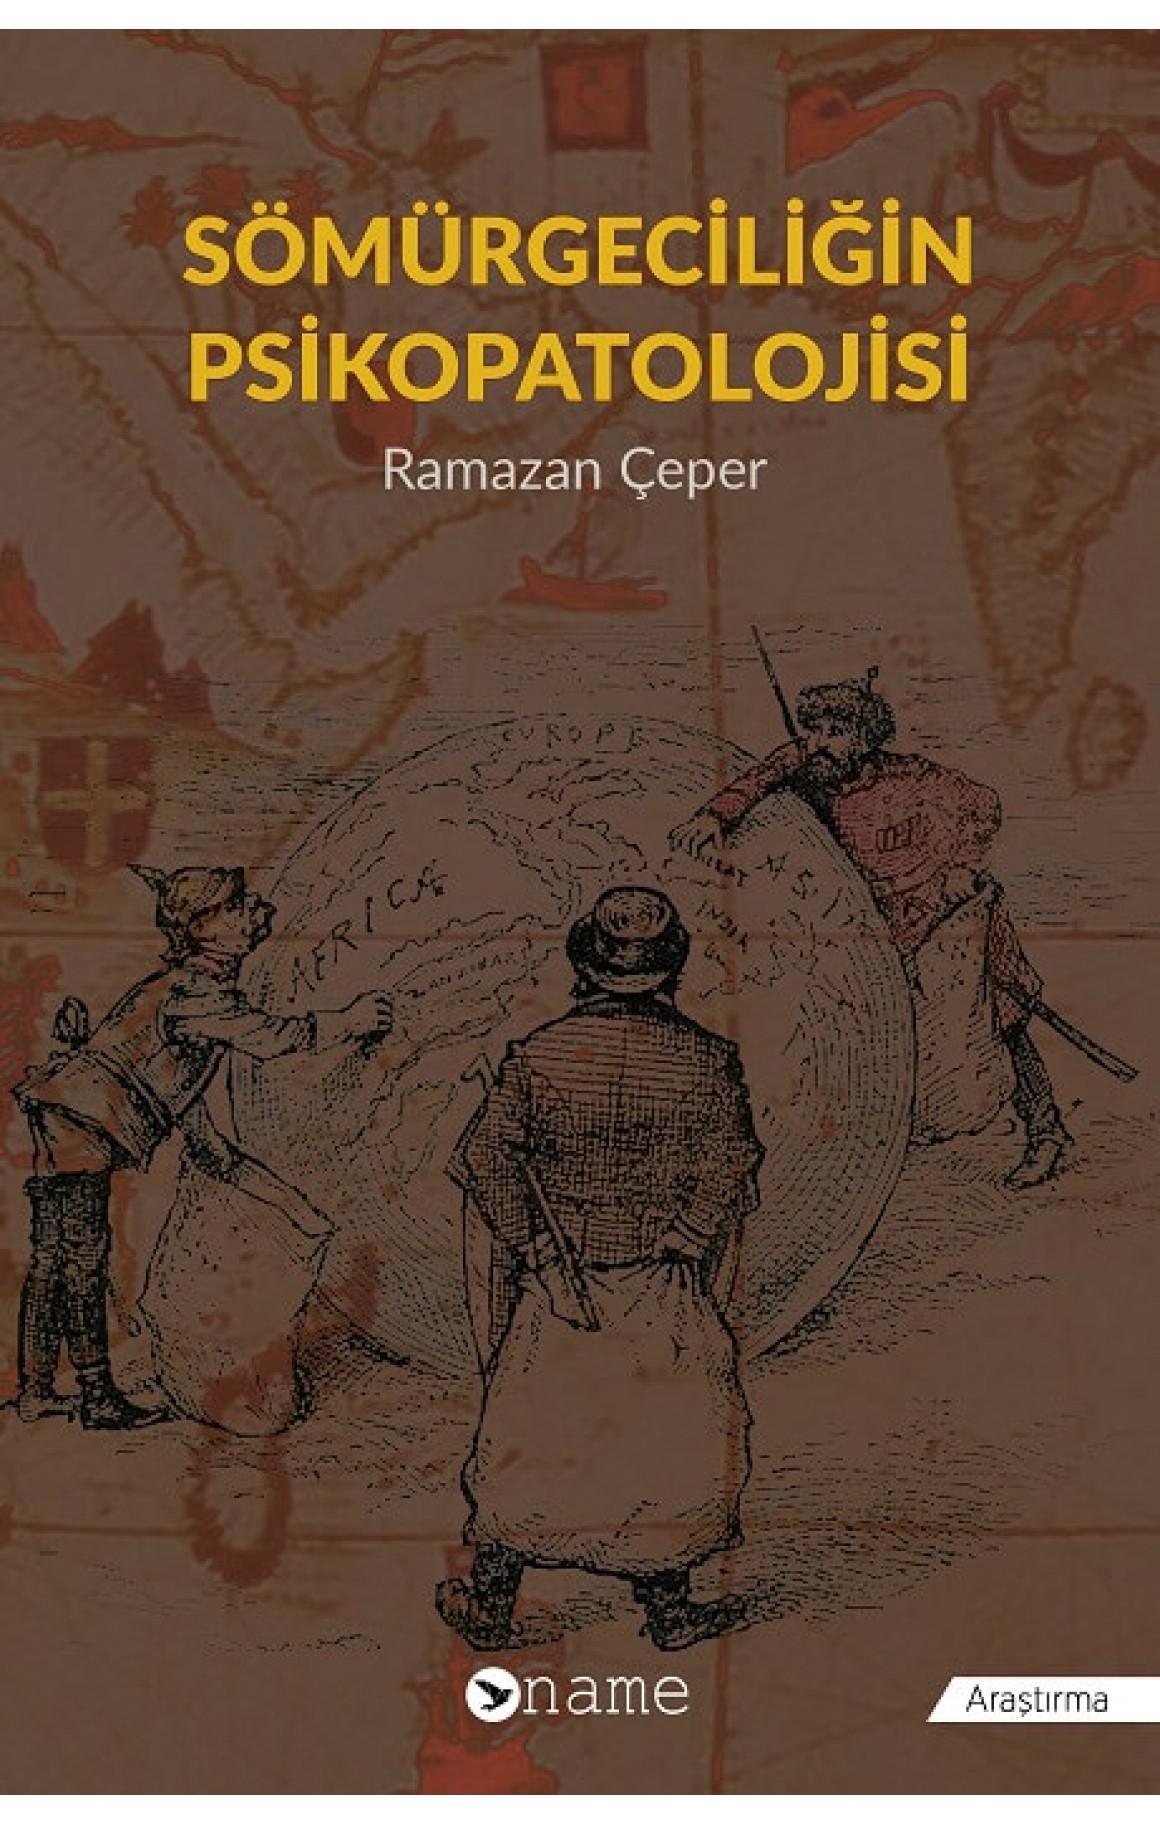 Sömürgeciliğin Psikopatolojisi